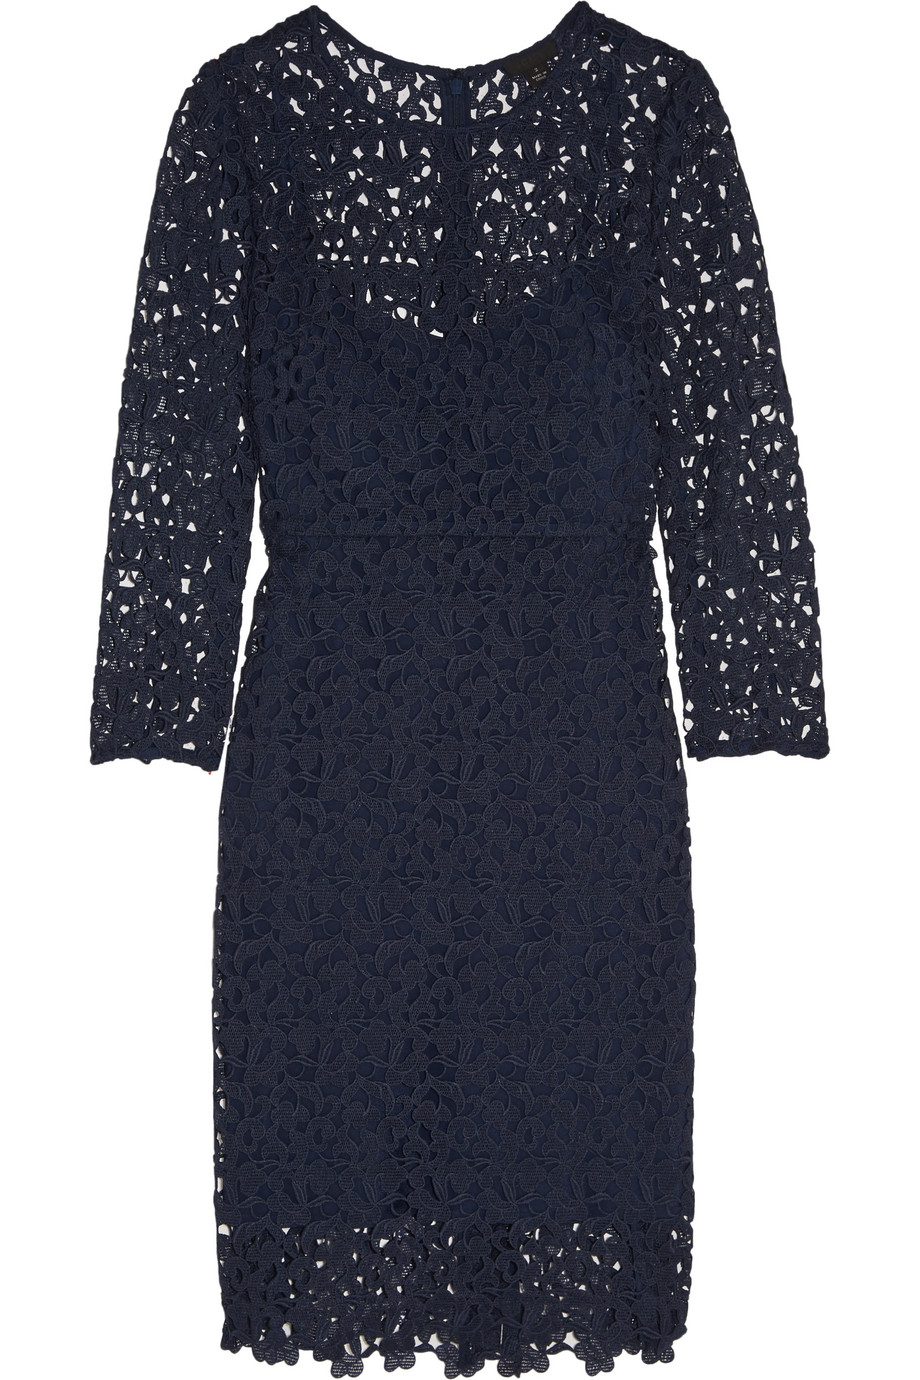 J.Crew Cadenza Guipure Lace Dress, Navy, Women's, Size: 2